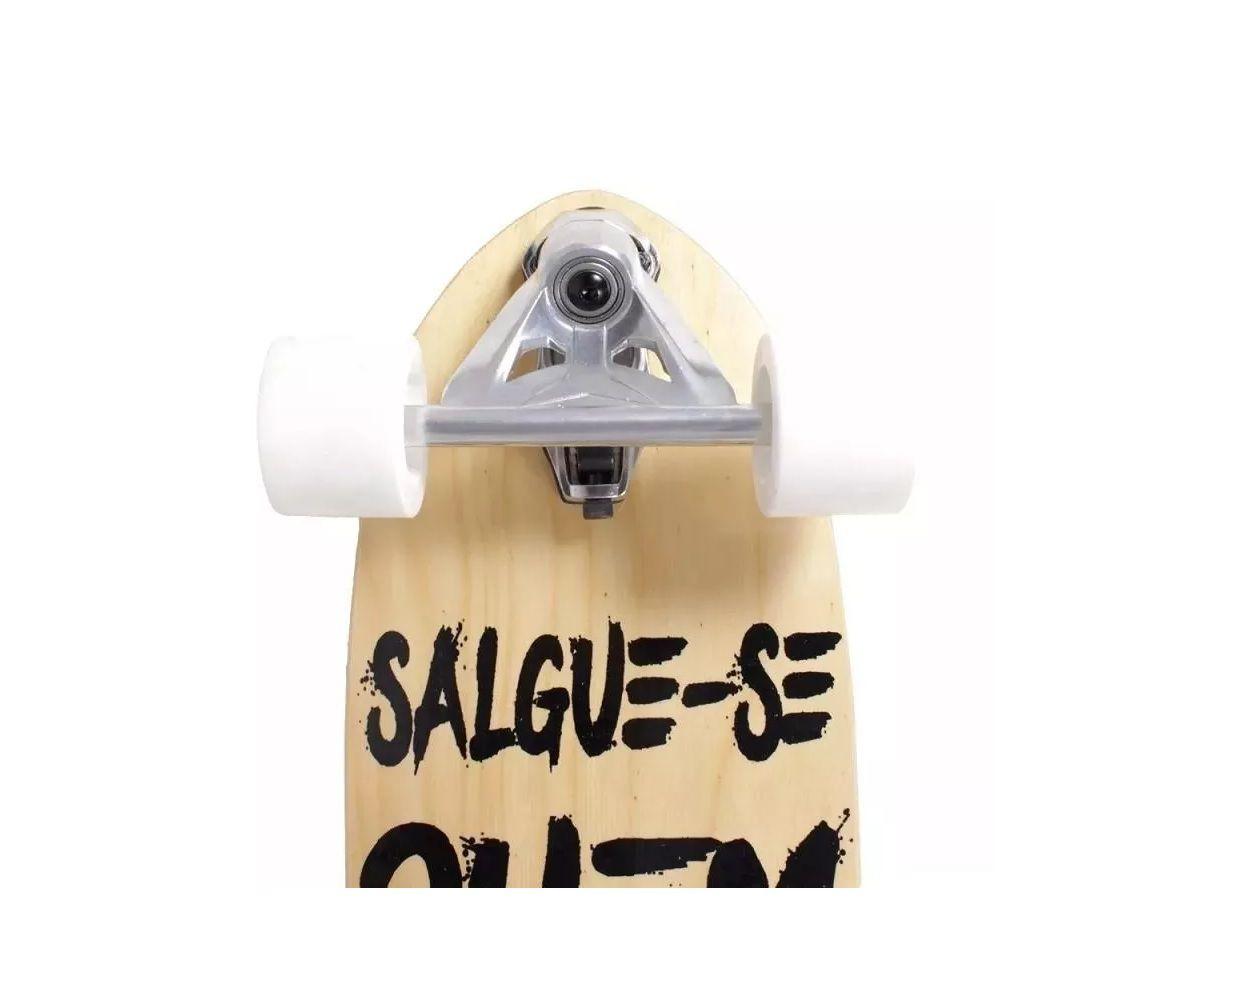 Skate Swingboard Simulador Salgue-se quem puder Mormaii